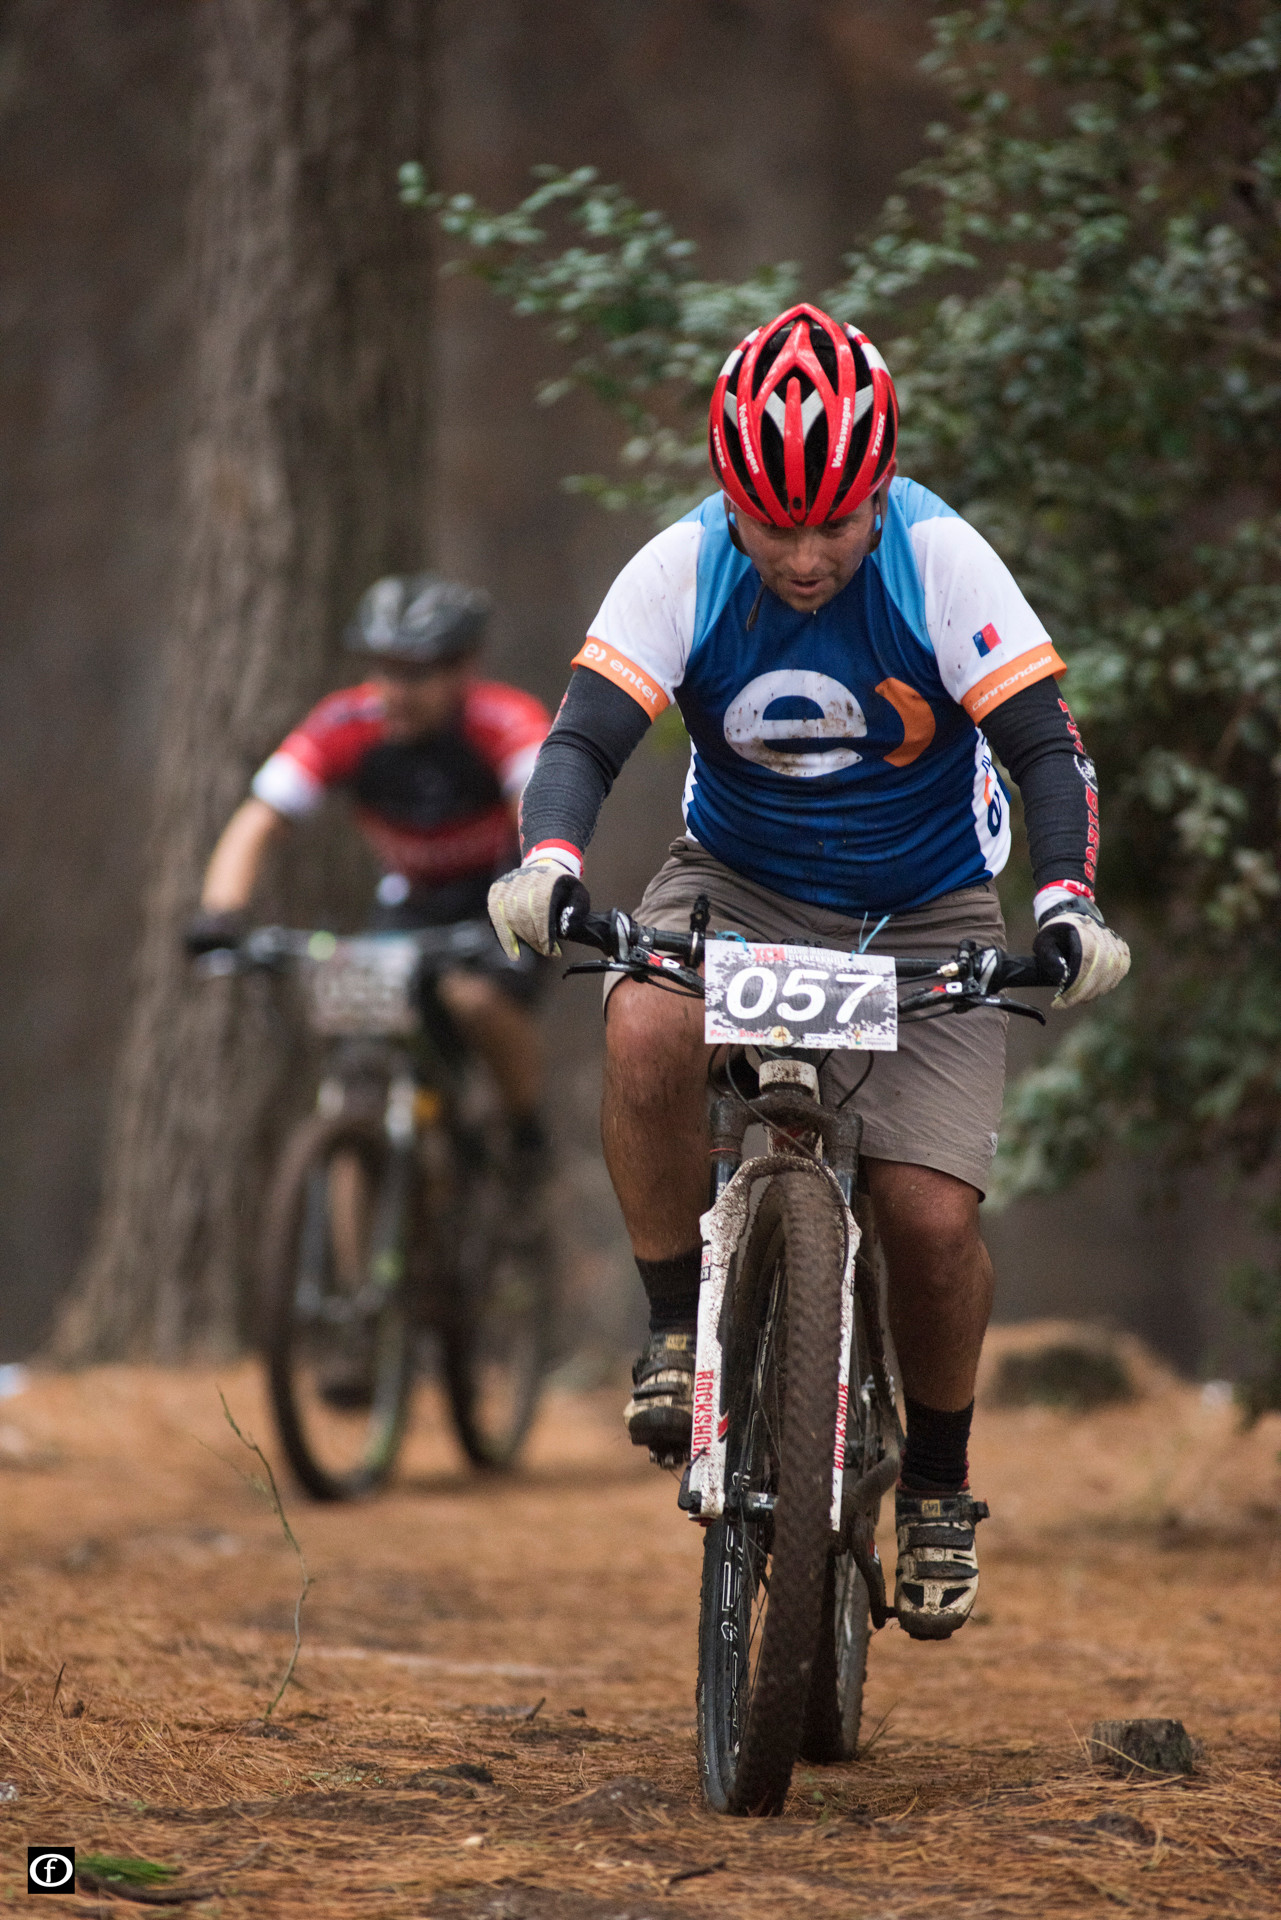 2015-05-17-Ciclismo Enduro-56.jpg